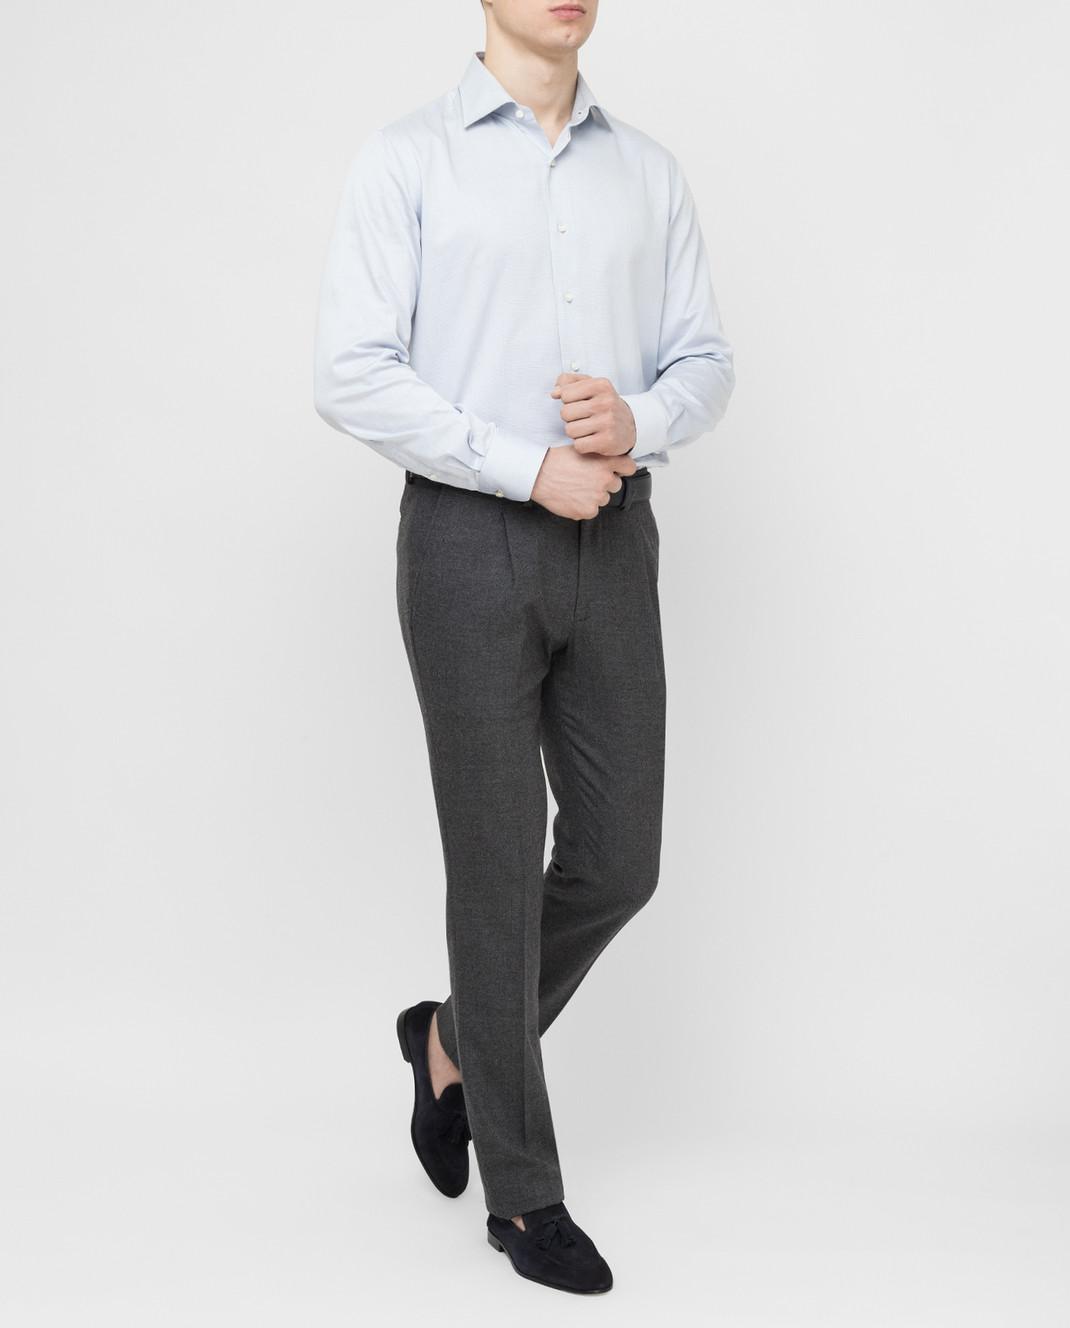 Luciano Lombardi Голубая рубашка 66216210 изображение 2